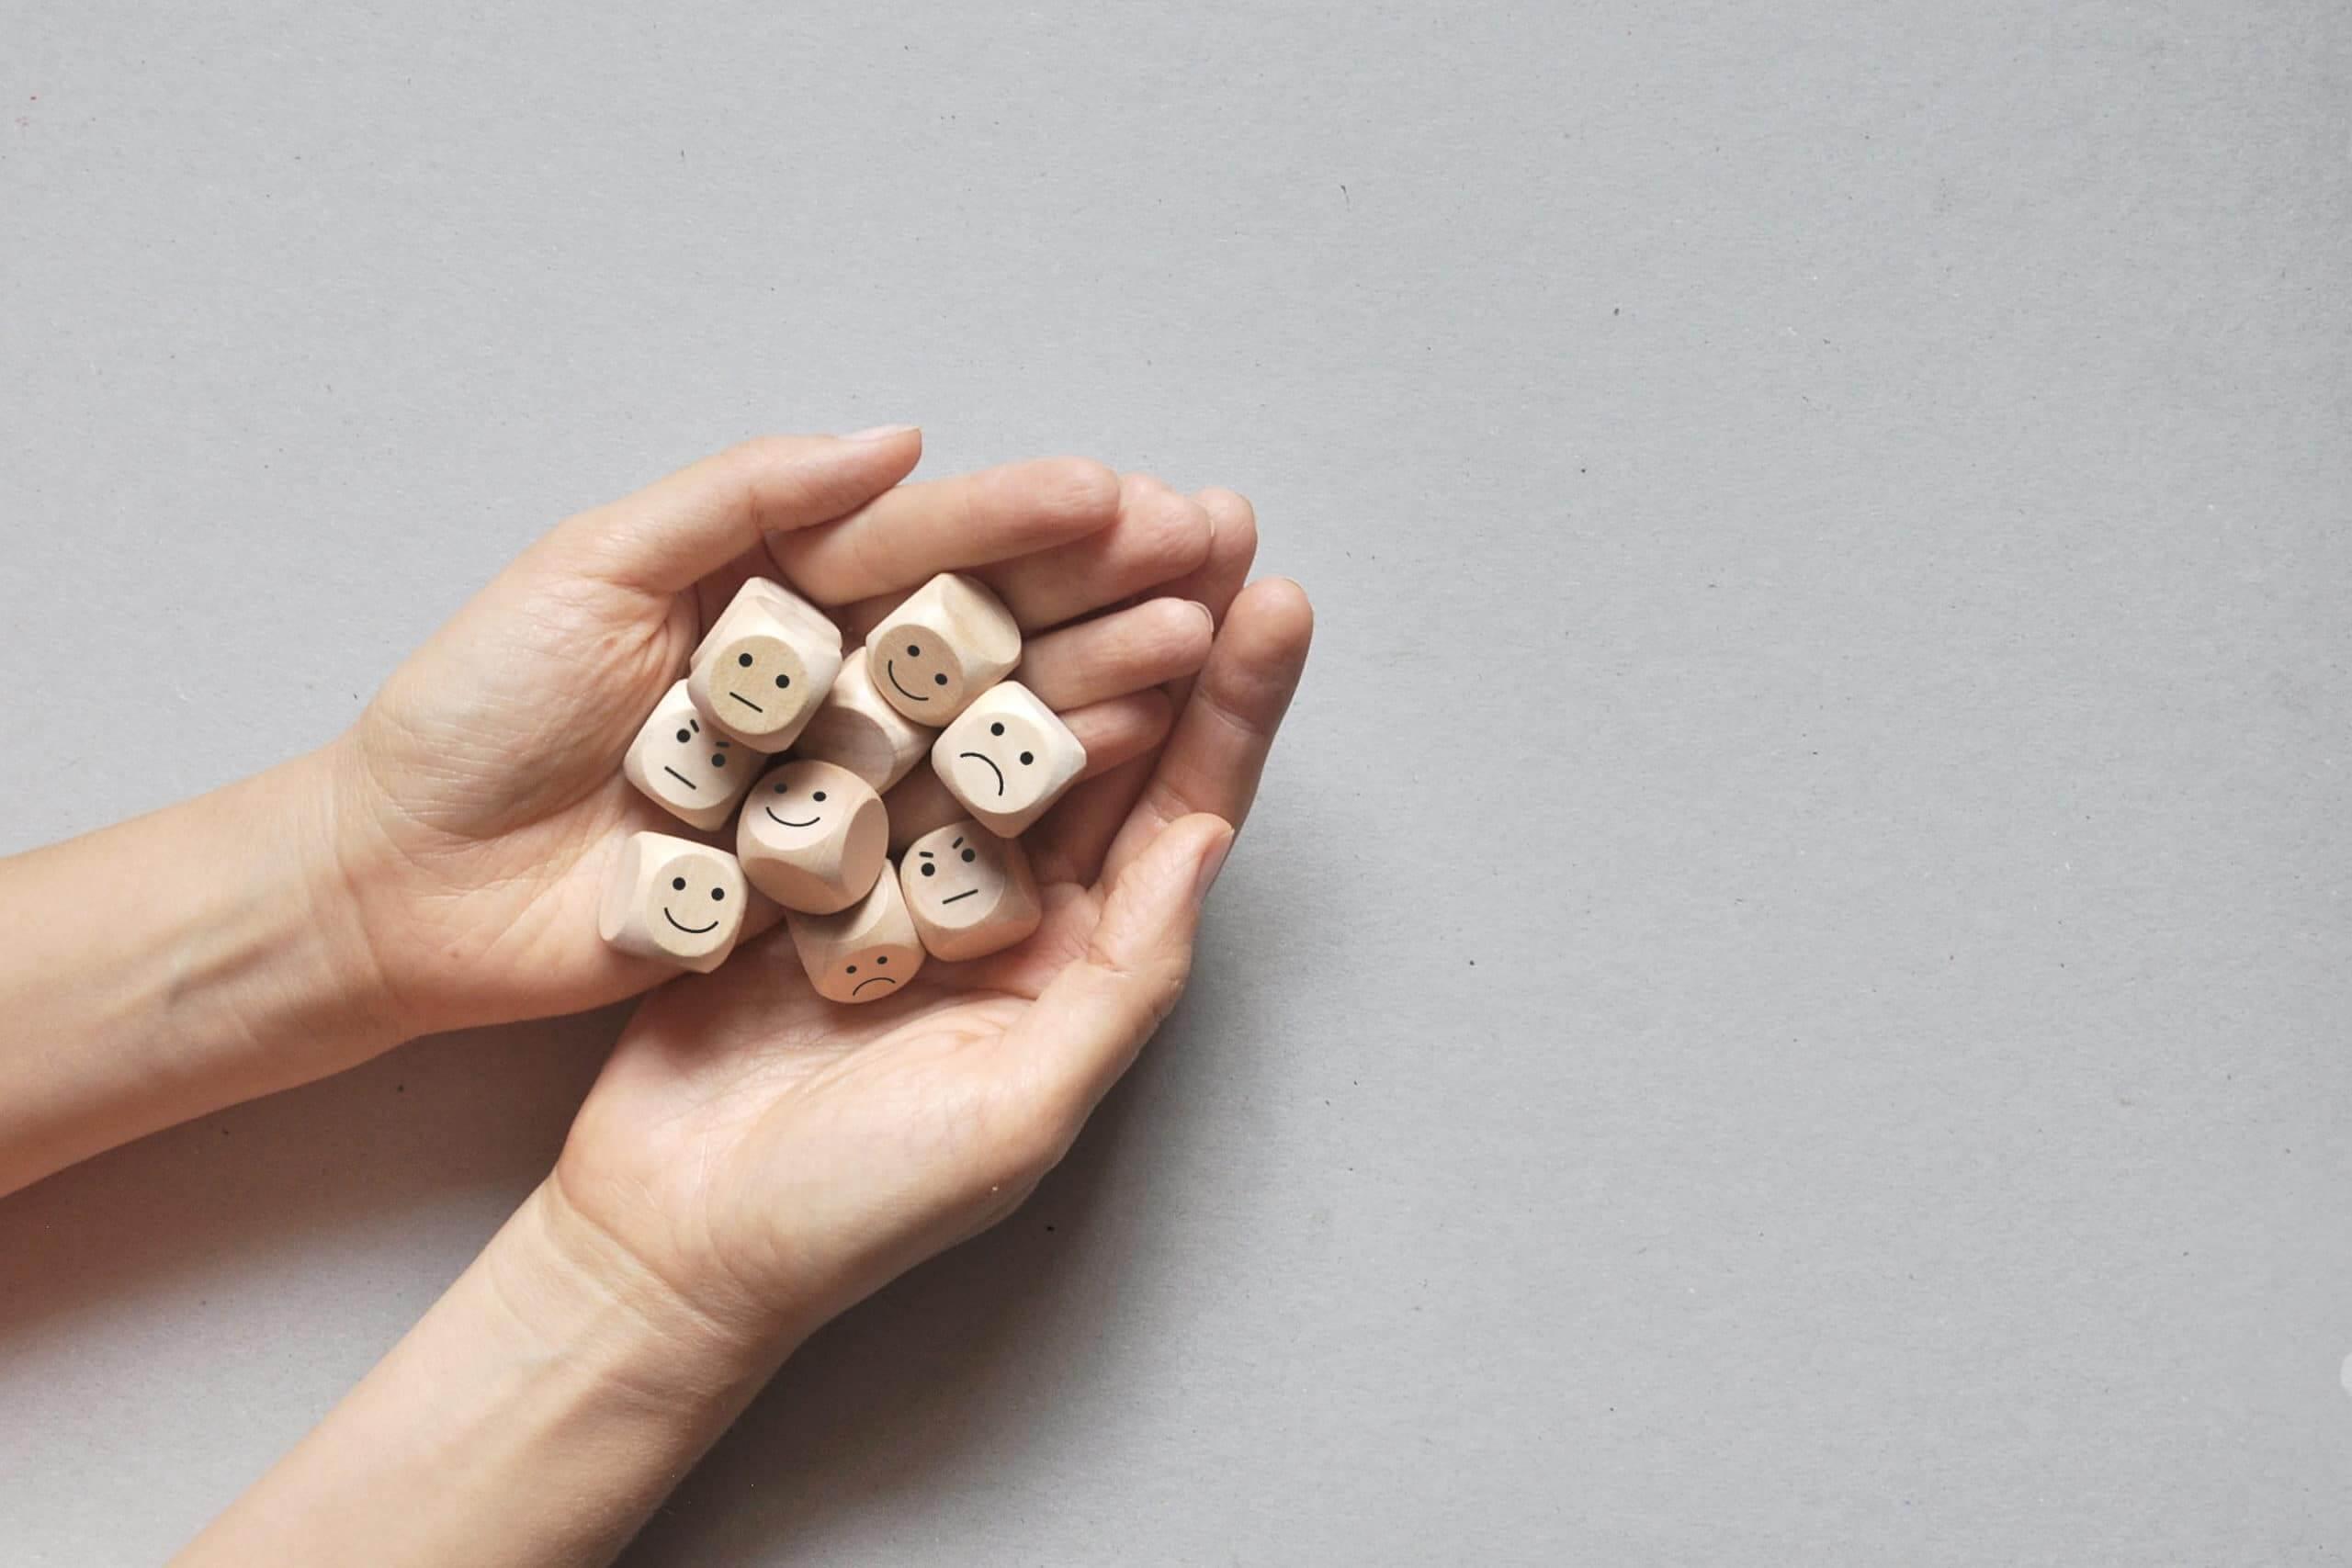 Image of emotions on wooden blocks. Joy, calm, sadness, anger.